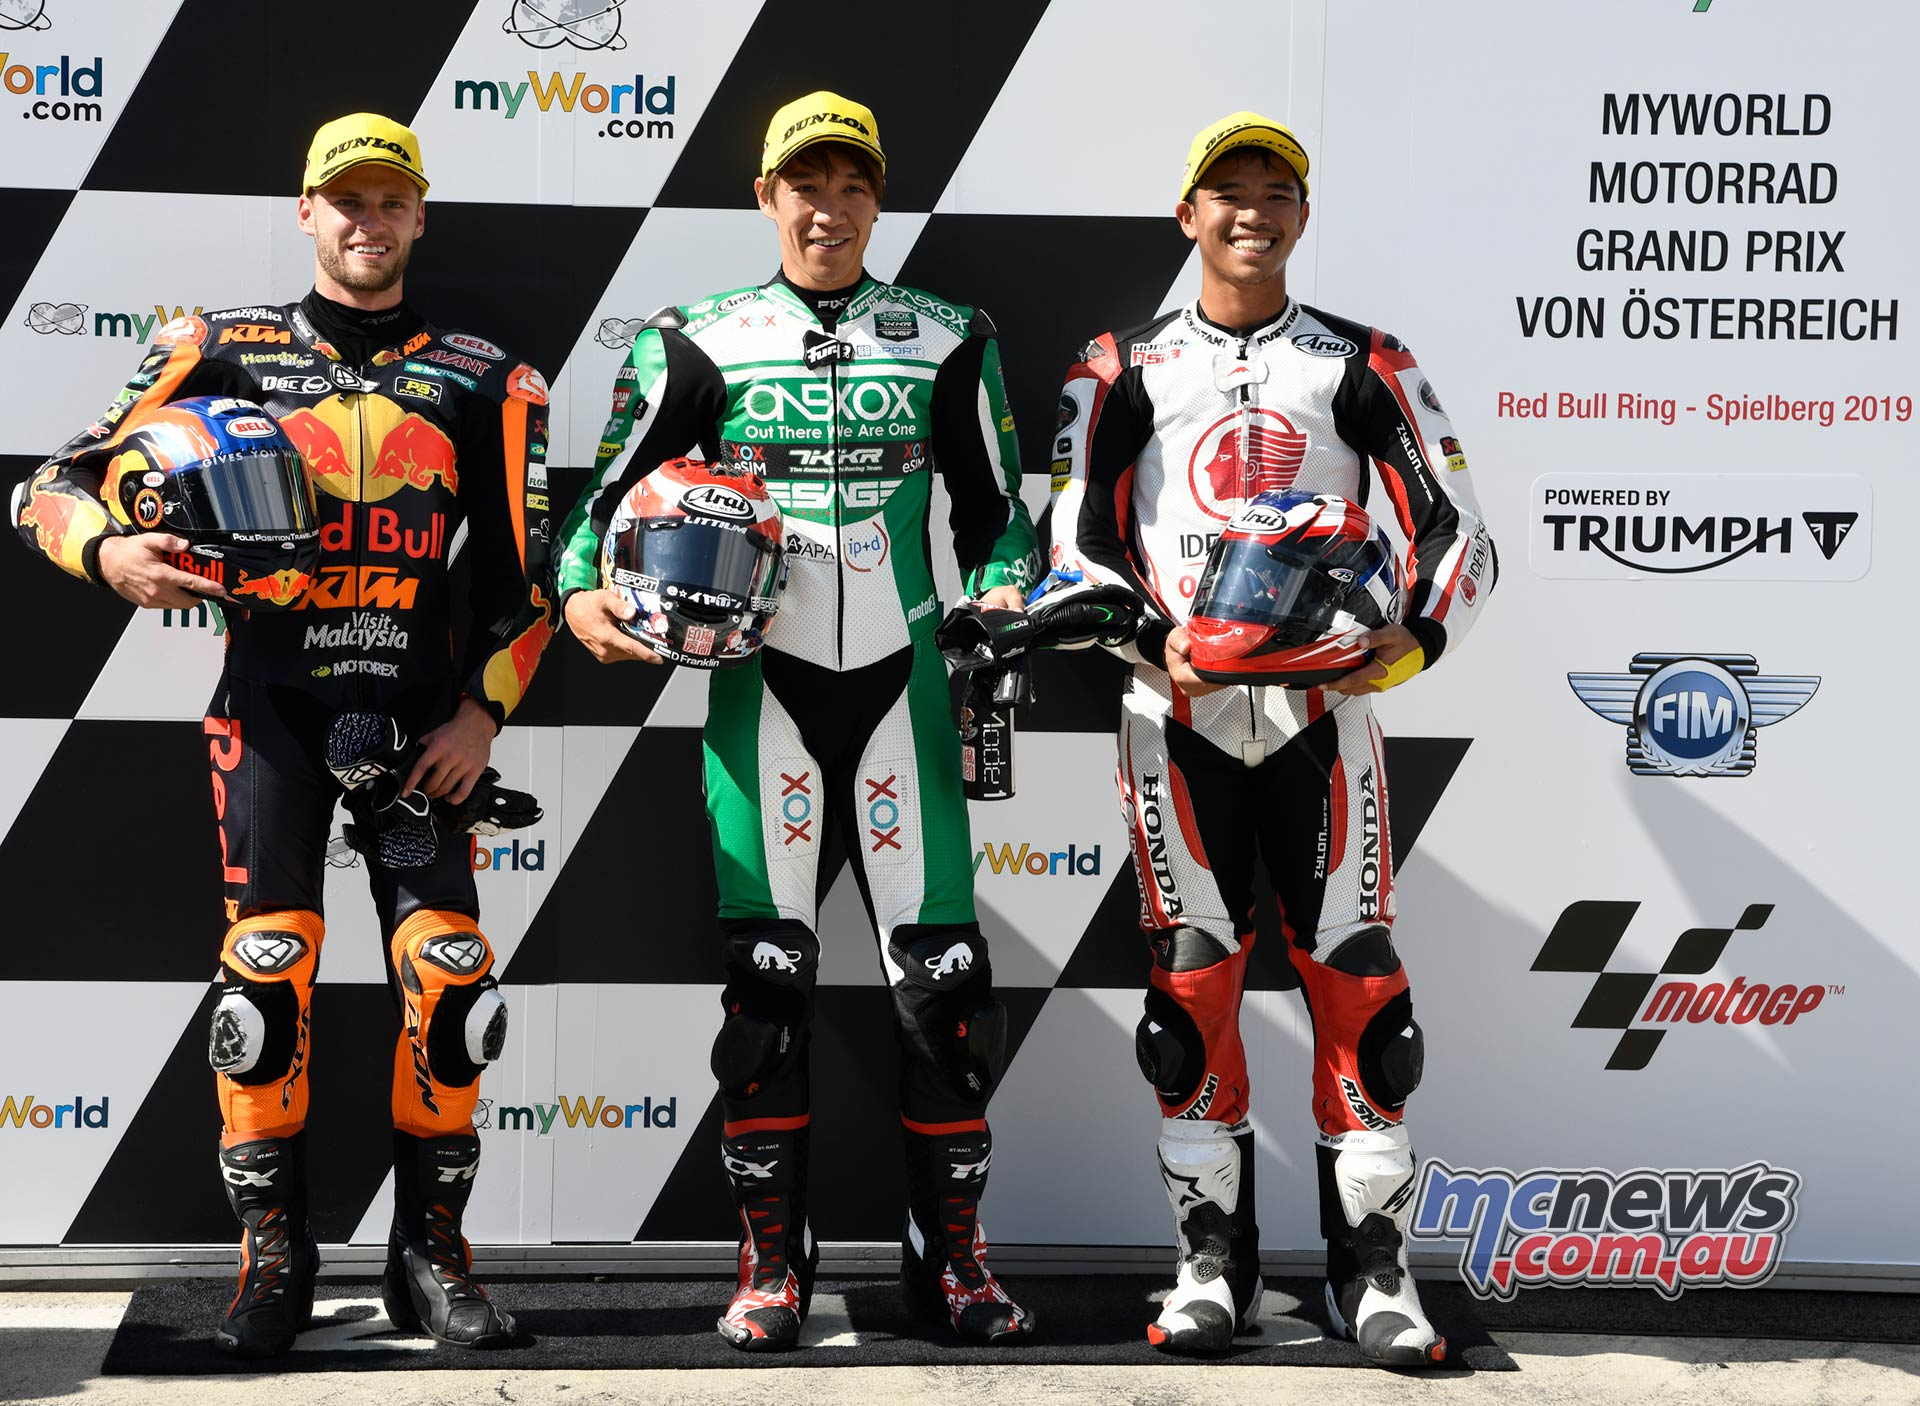 MotoGP Rnd Austria QP Moto Tetsuta Nagashima Binder Chantra